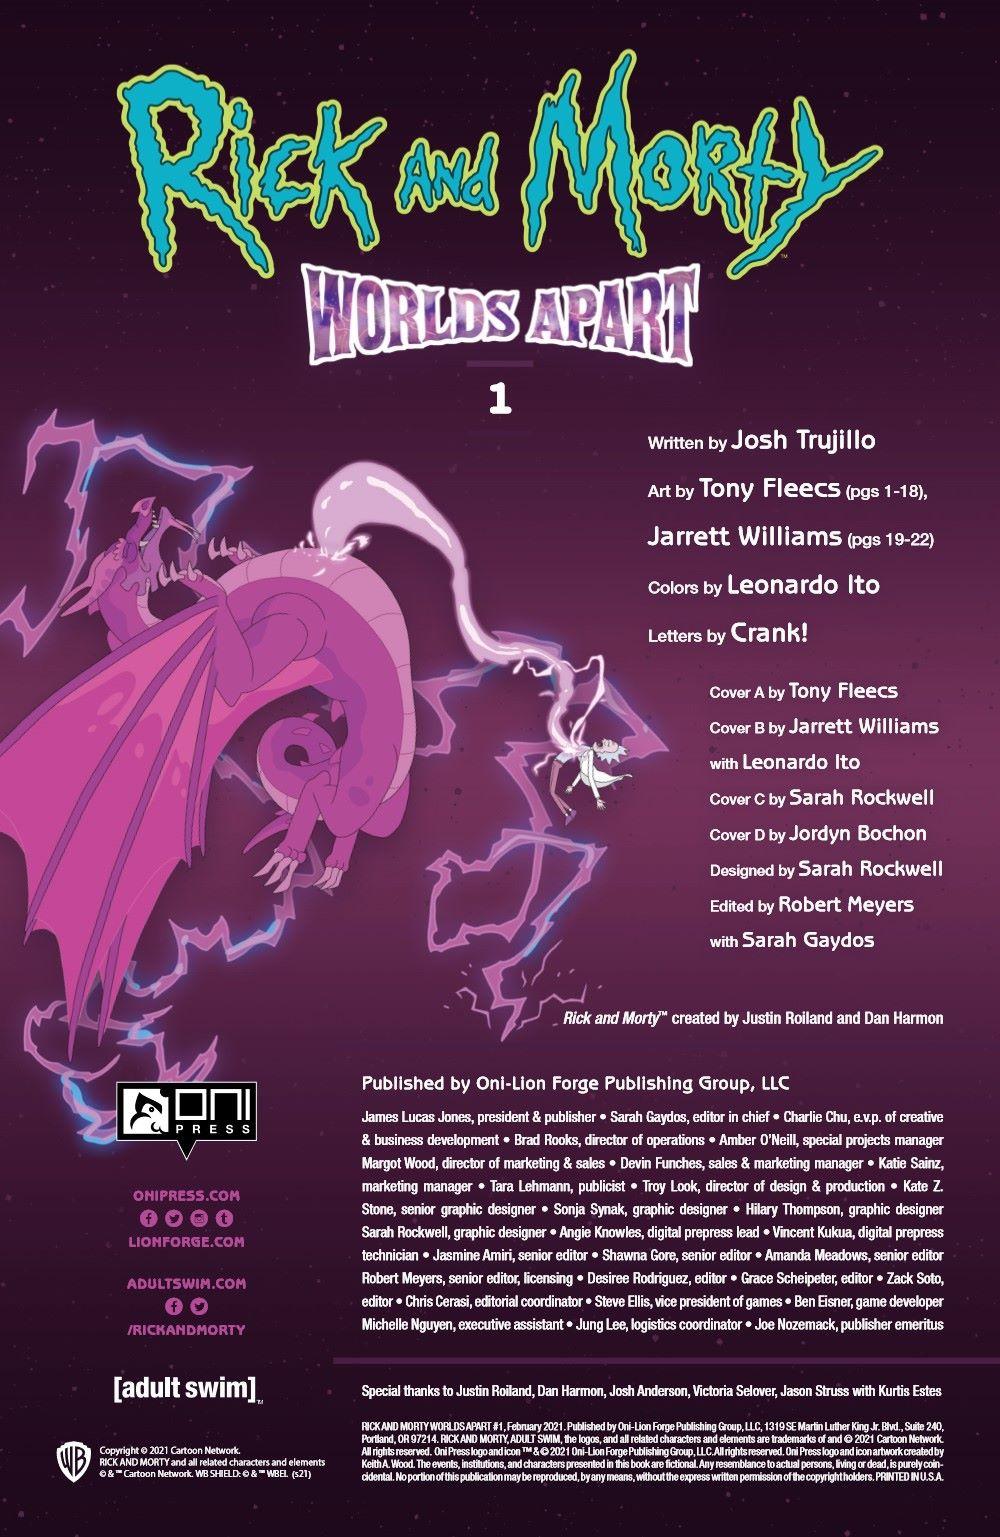 RICKMORTY-WORLDSAPART-1-MARKETING-05 ComicList Previews: RICK AND MORTY WORLDS APART #1